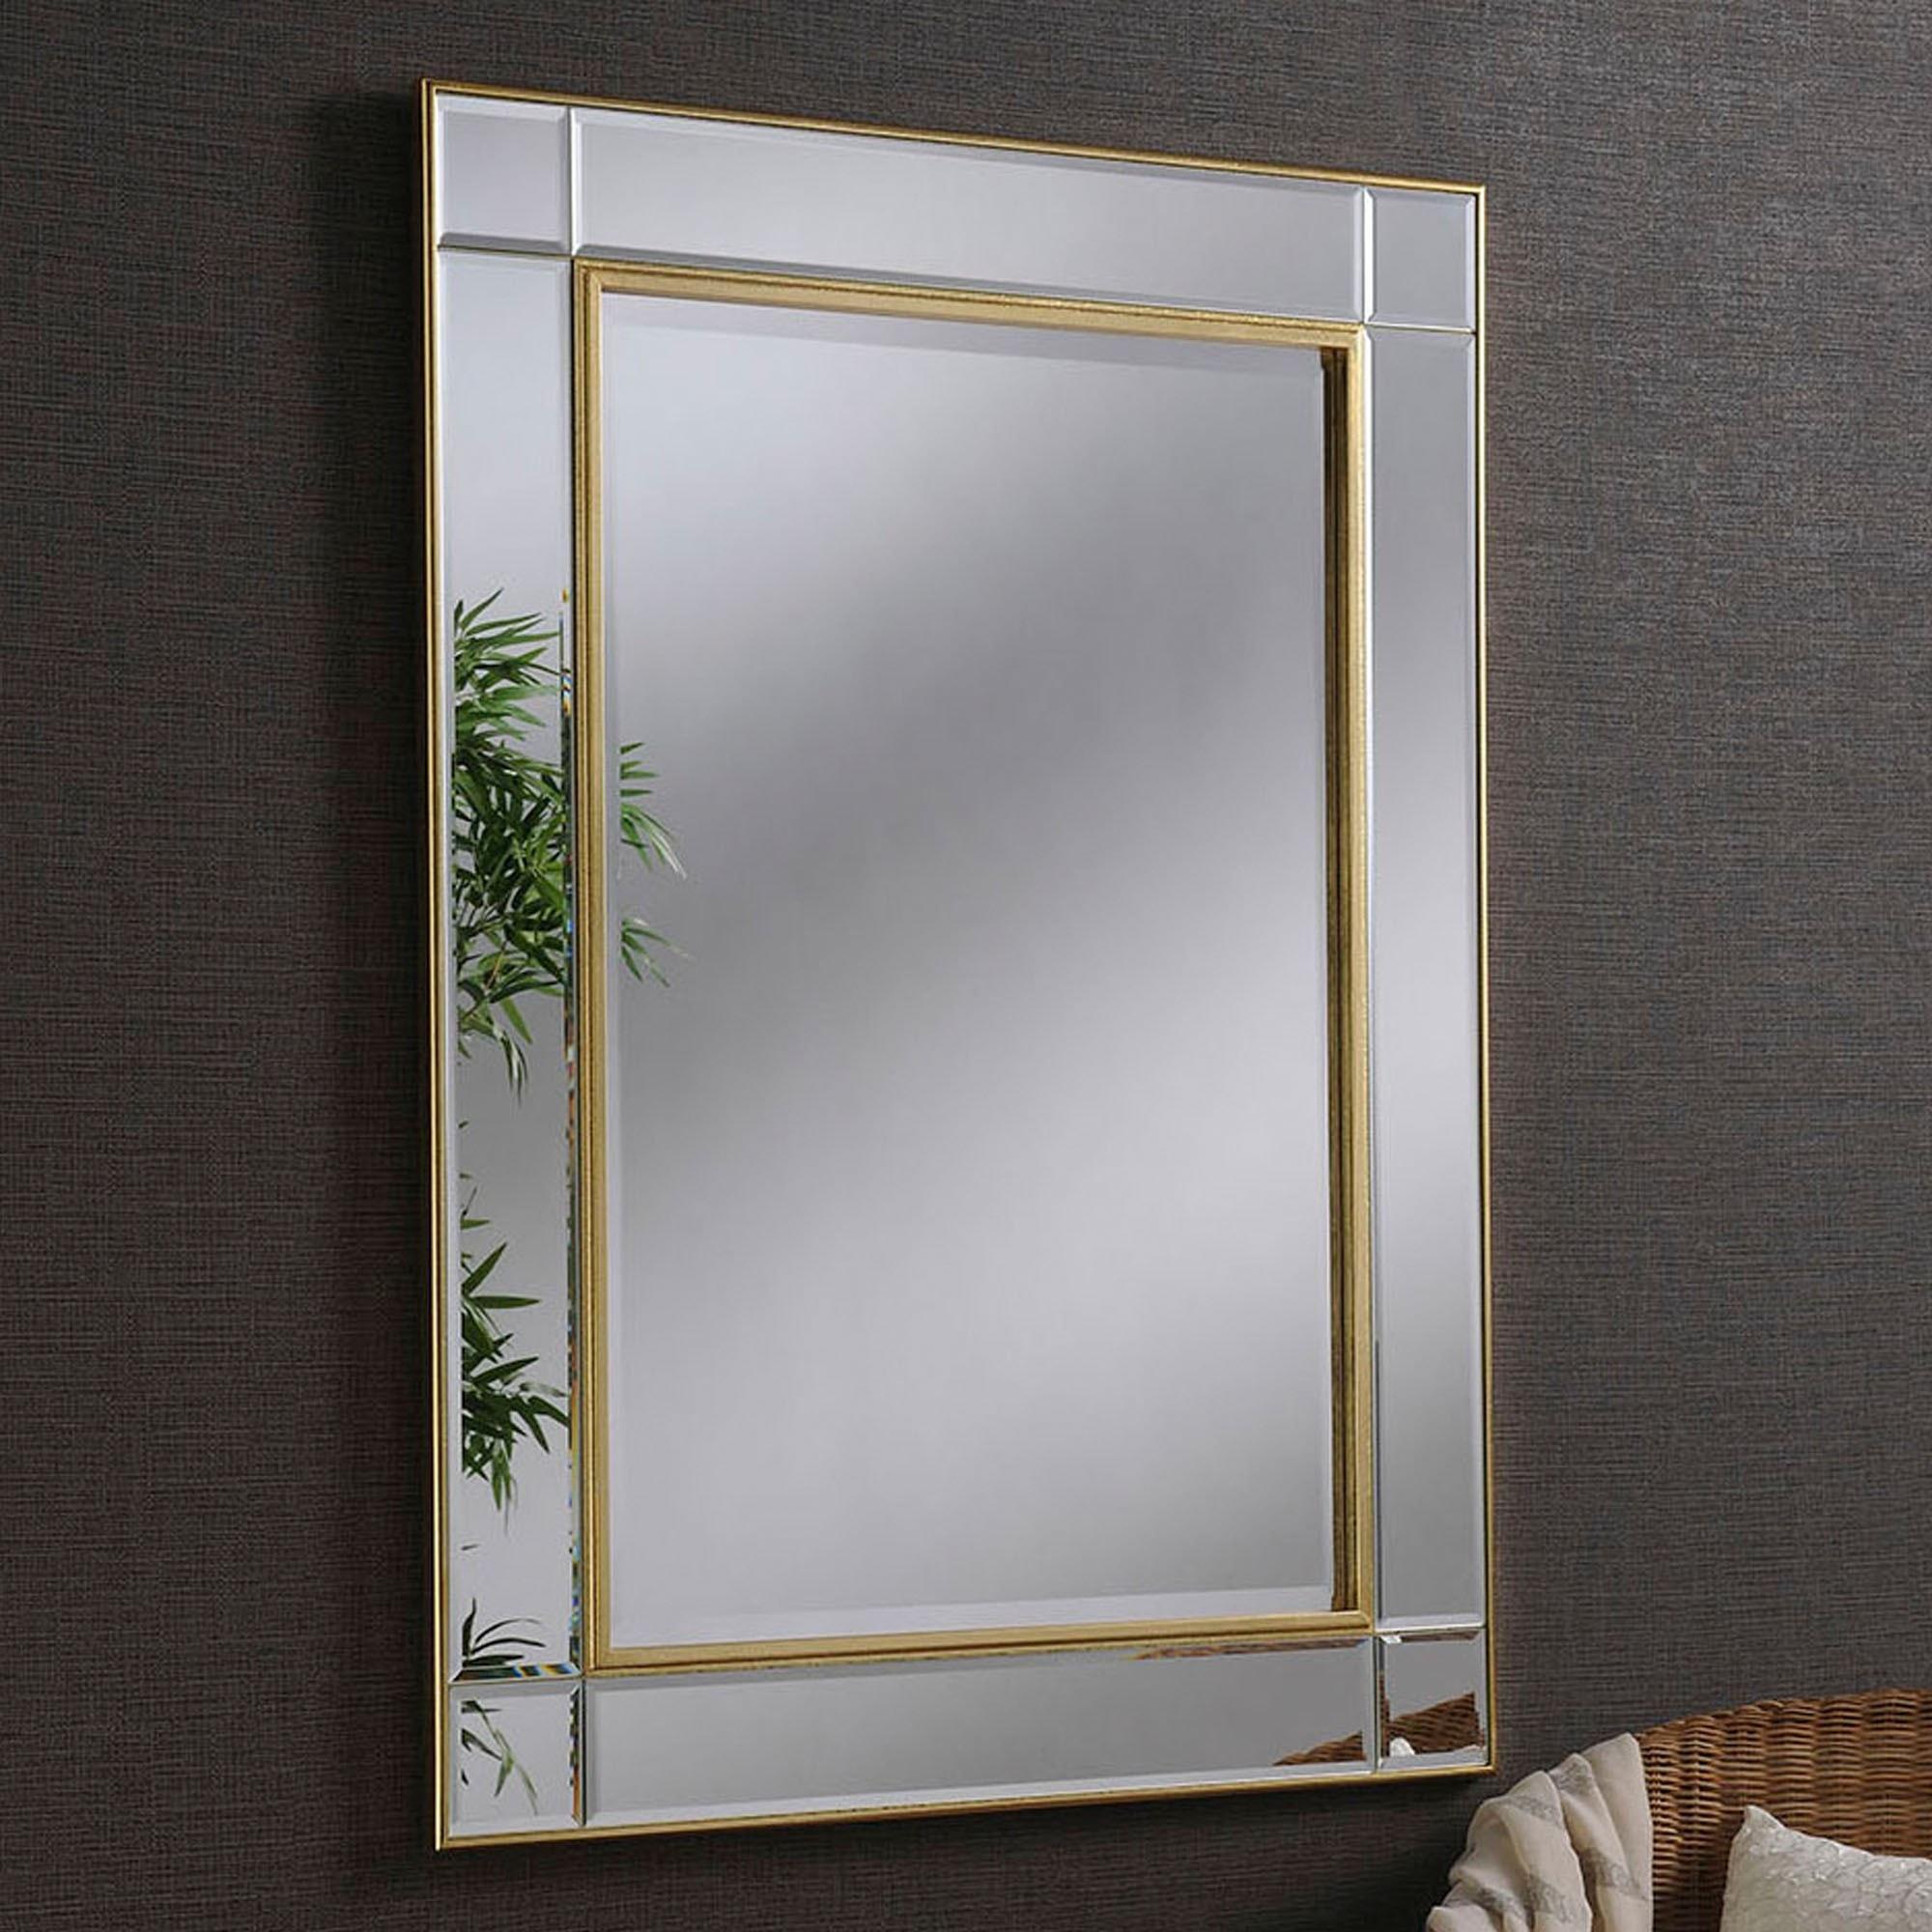 Contemporary Gold Beveled Wall Mirror Contemporary Wall Mirrors